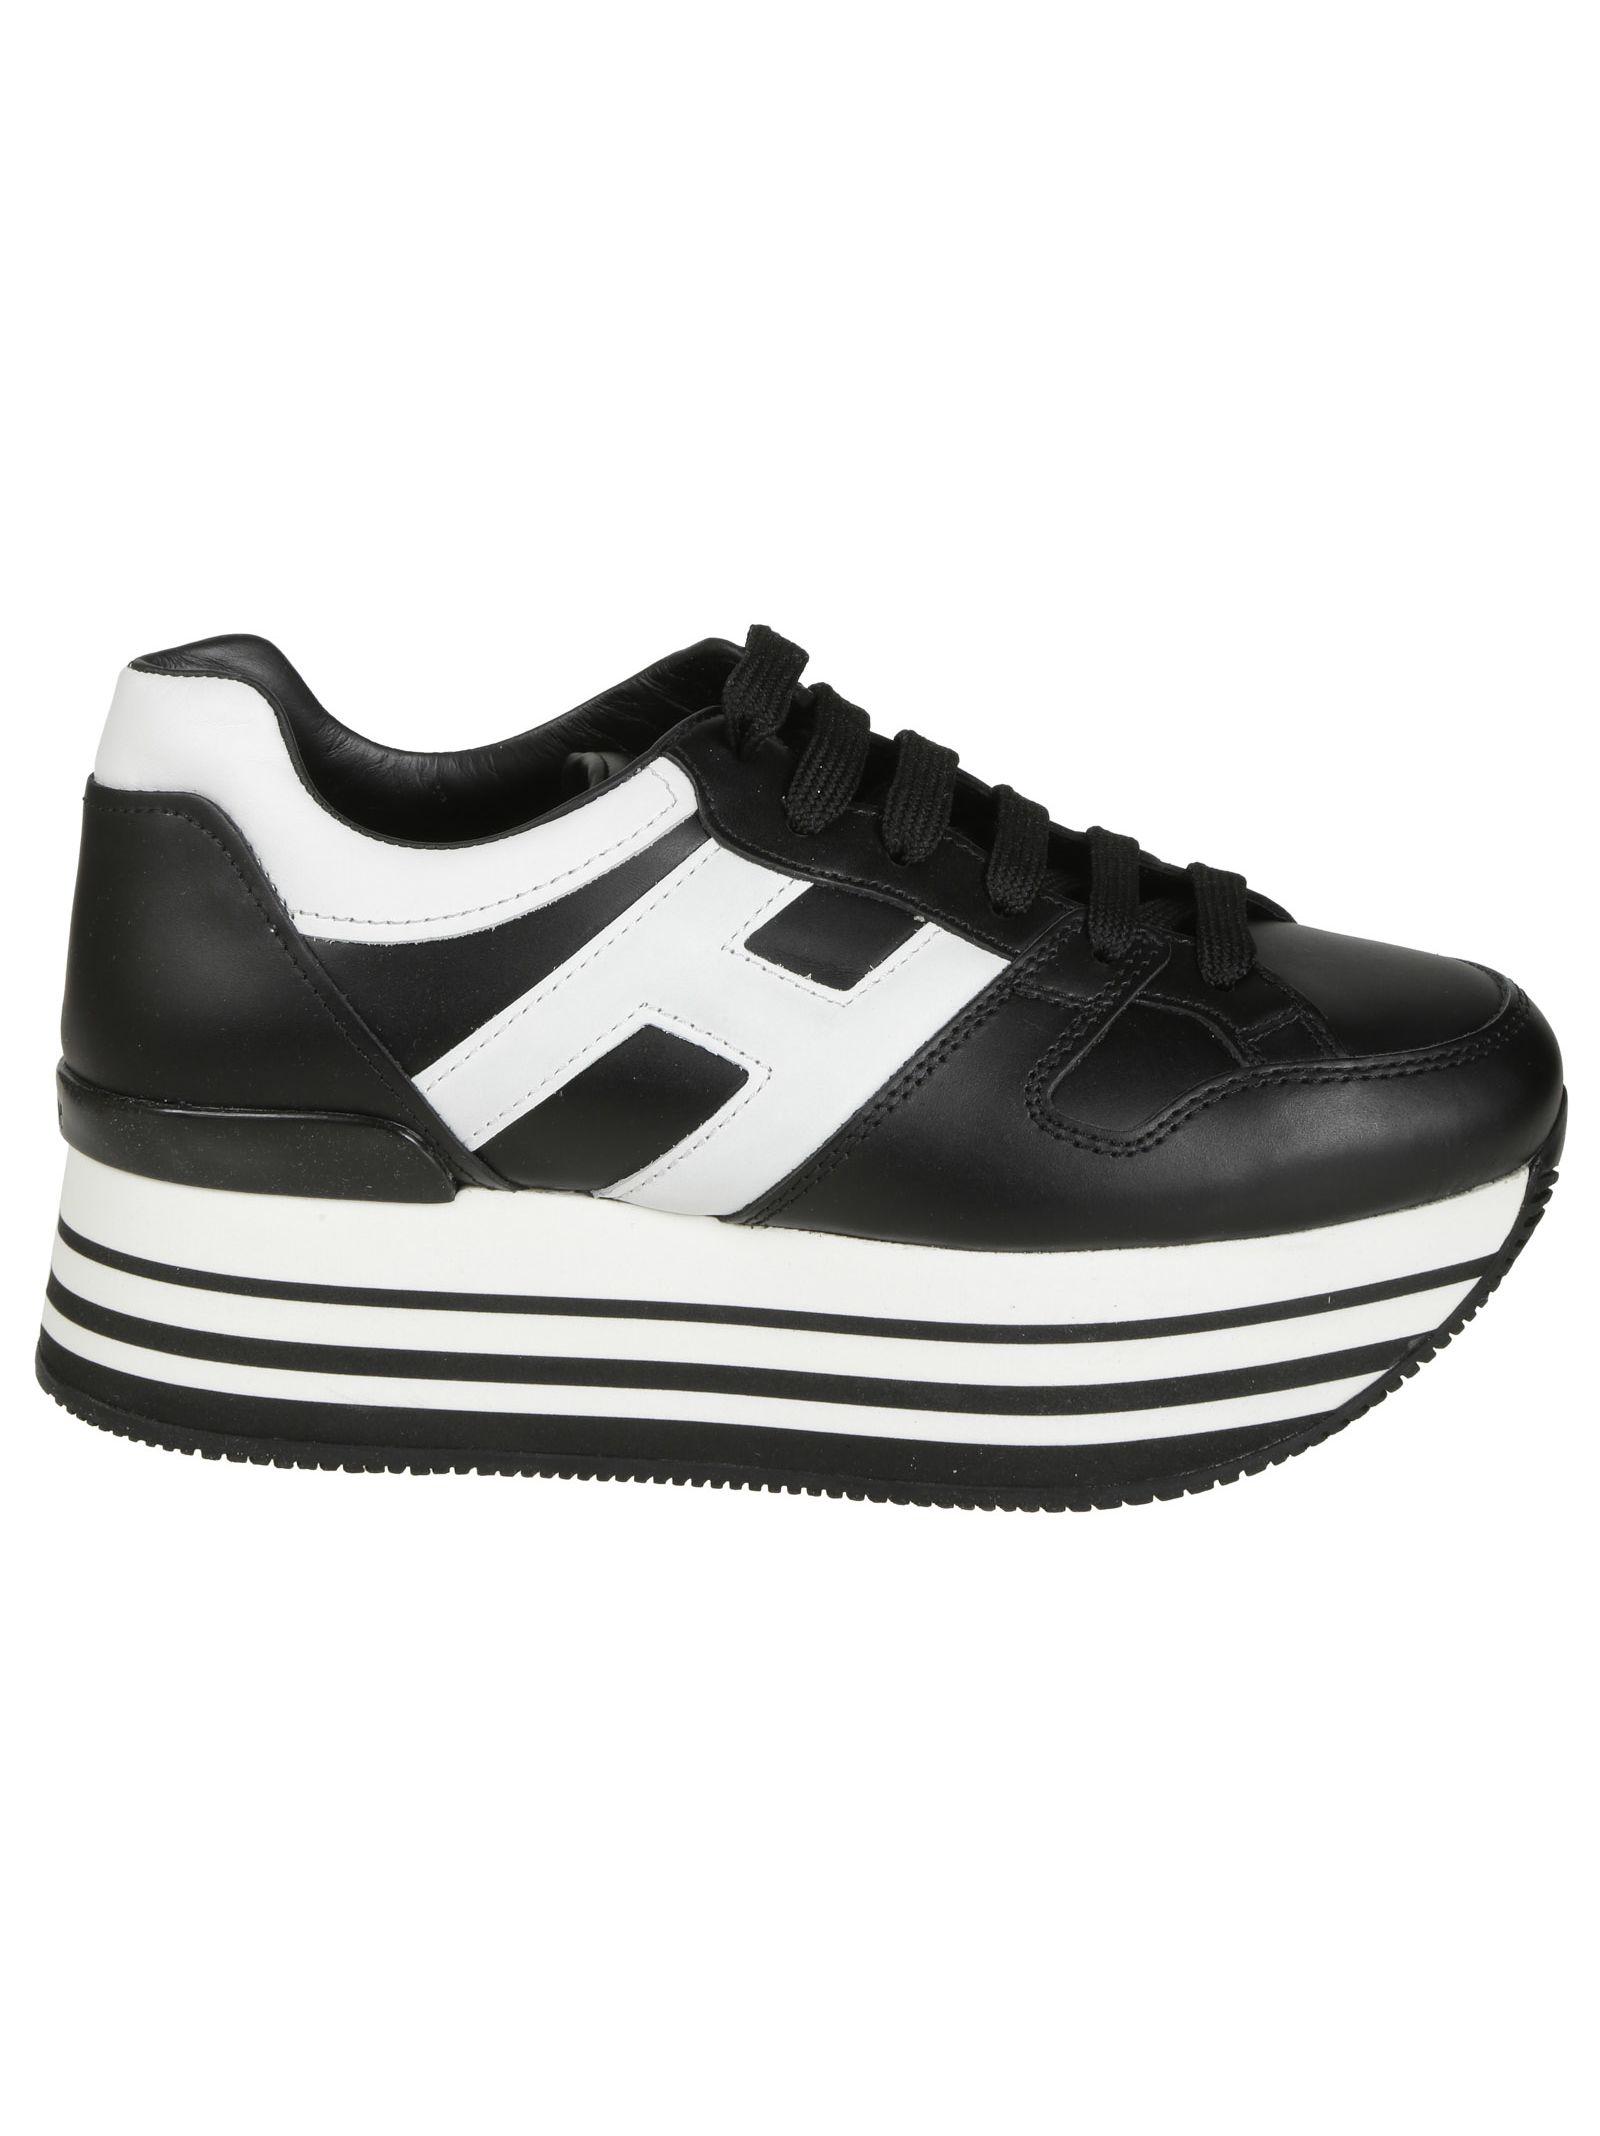 Hogan Classic Platform Sneakers